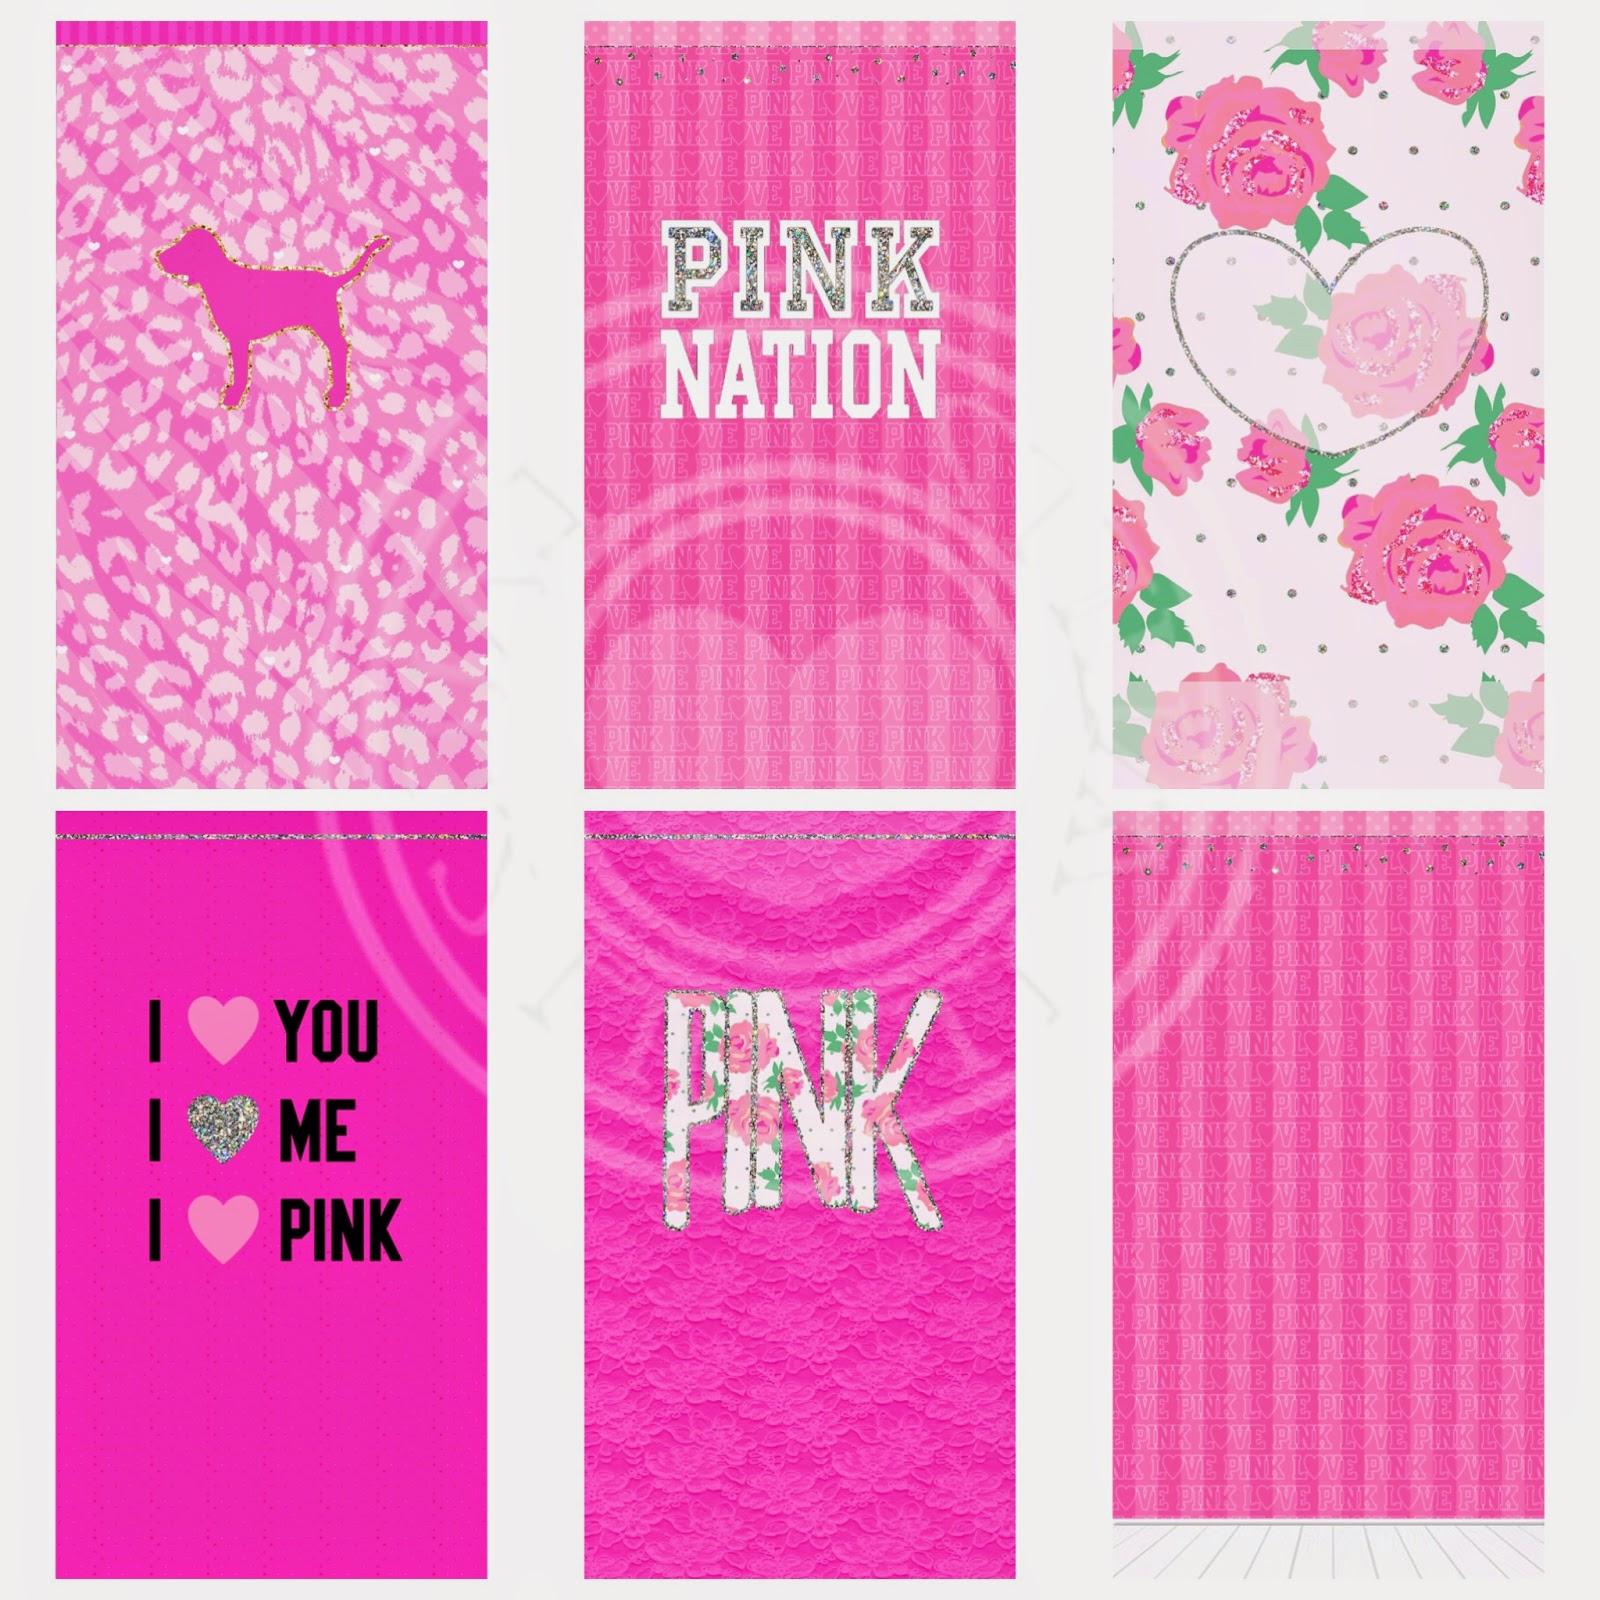 Pretty Walls PINK NATION 15 PIECE WALLPAPER SET